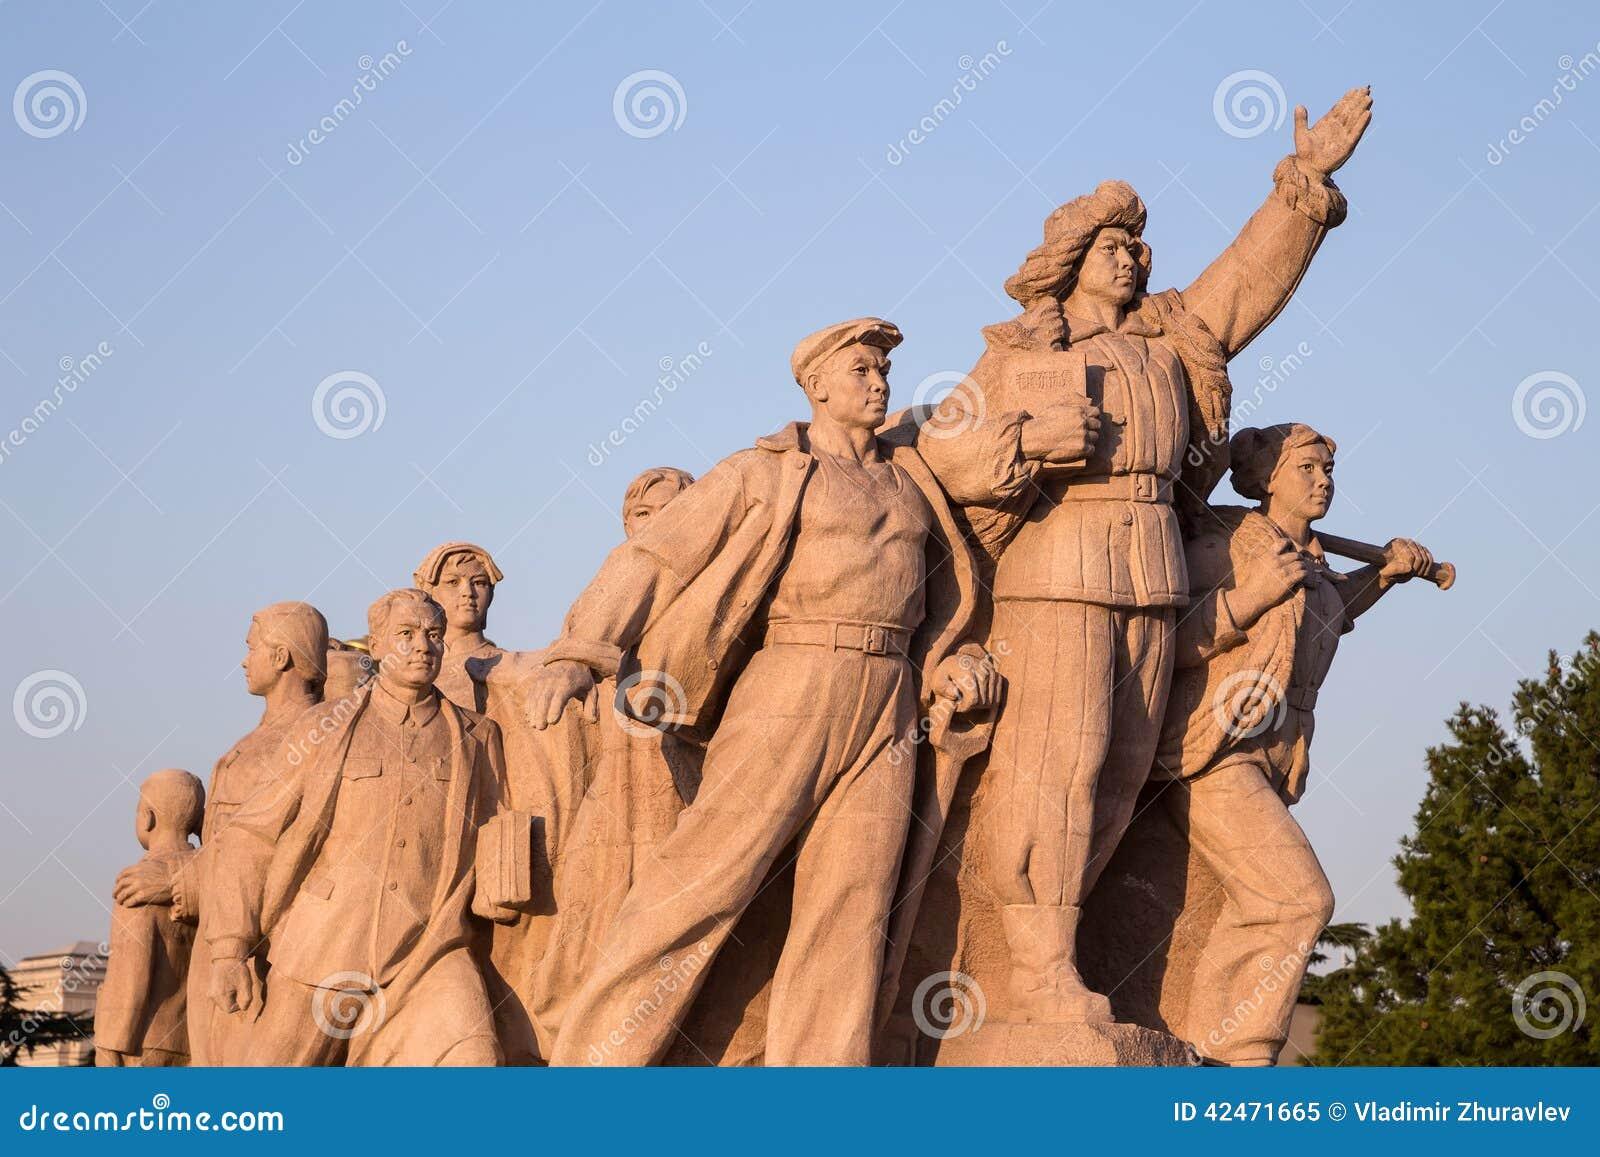 Revolutionäre Statuen am Tiananmen-Platz in Peking, China